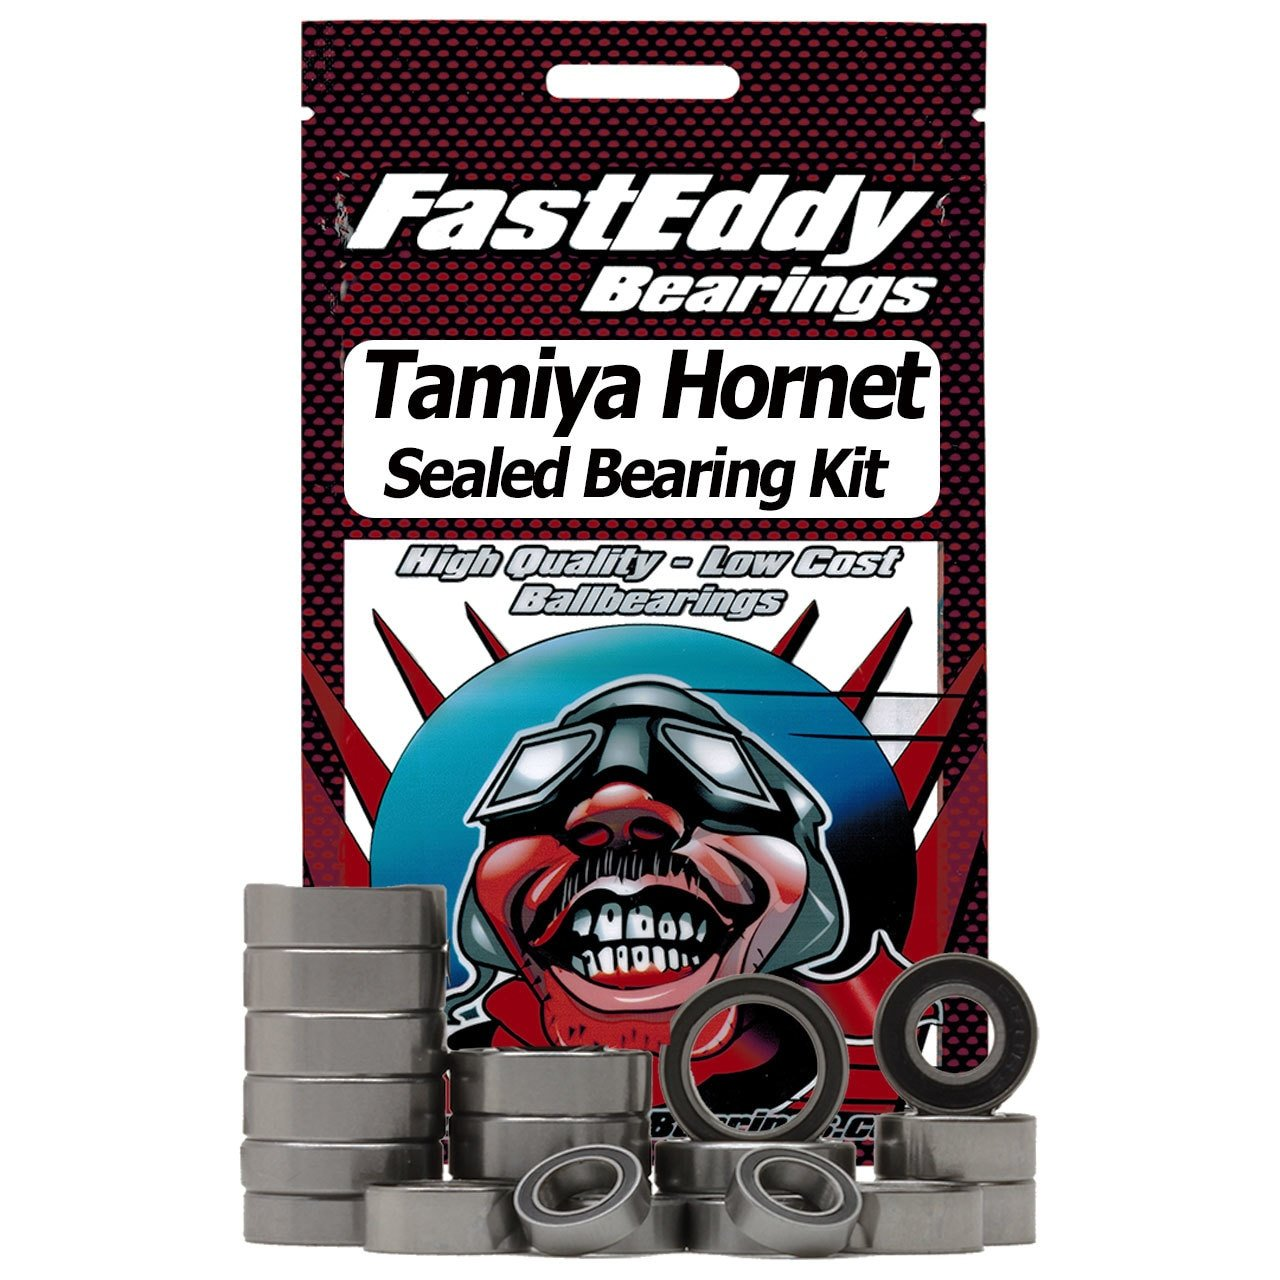 Tamiya Hornet Black Metallic Ltd Edition 58043 Sealed Ball Bearing Kit for RC Cars